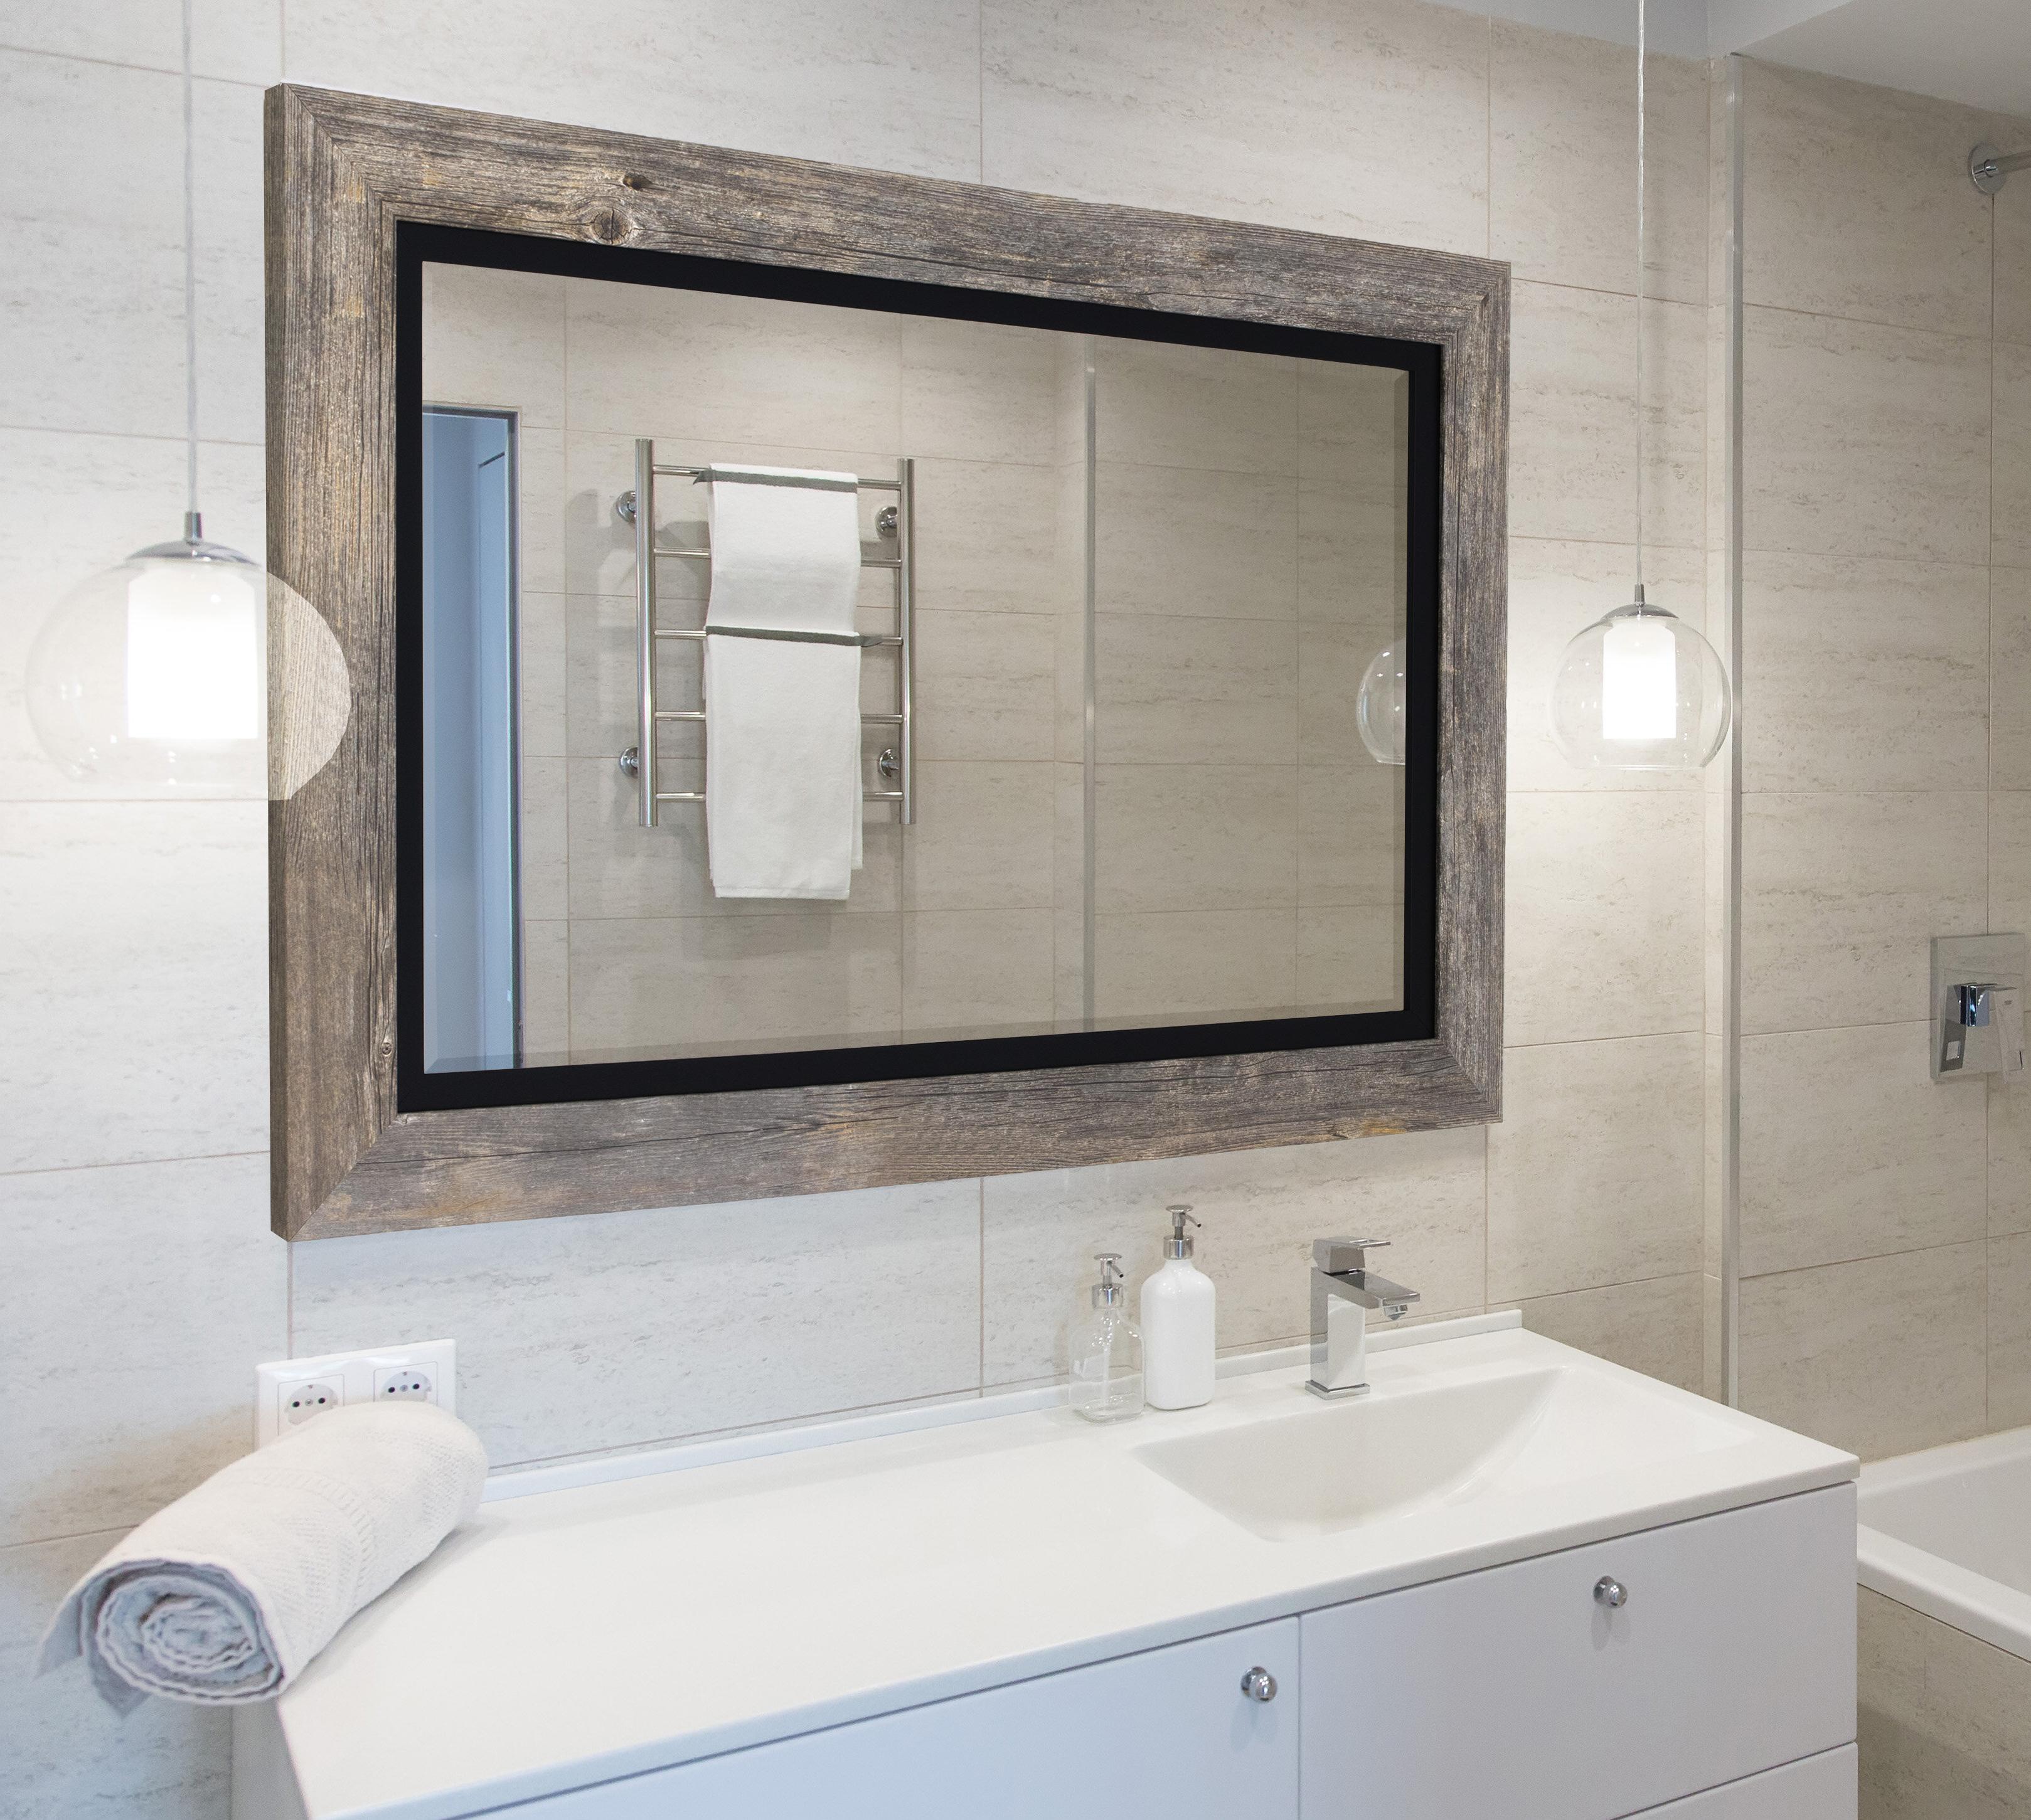 Newest Hilde Traditional Beveled Bathroom Mirror In Landover Rustic Distressed Bathroom/vanity Mirrors (View 20 of 20)